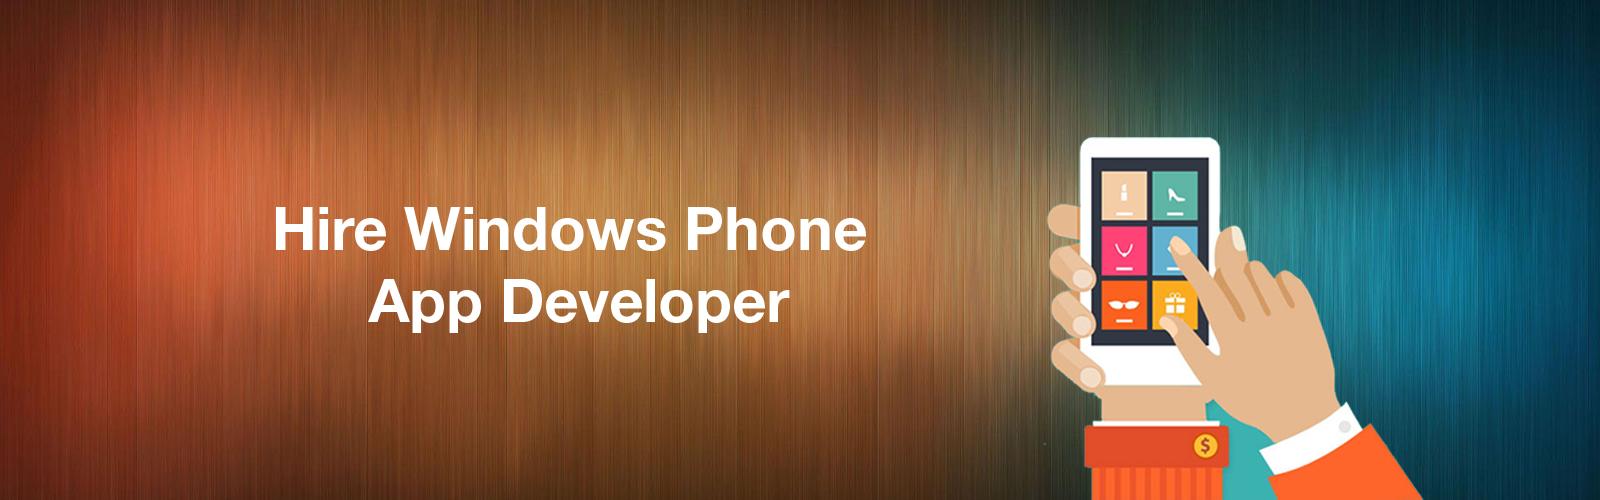 Hire Windows Phone App Developer